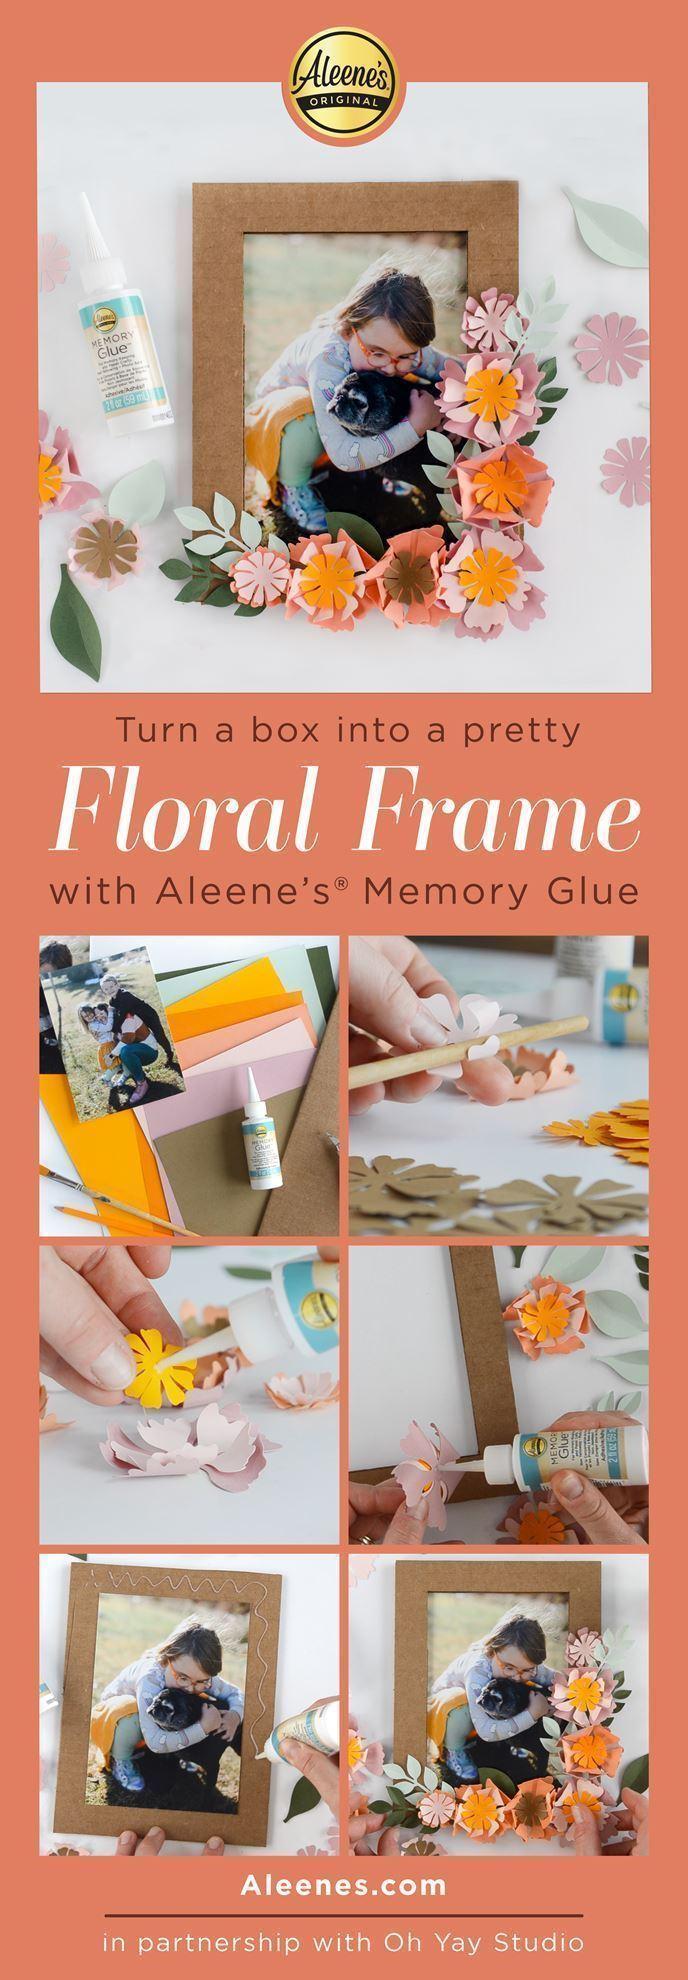 Paper Flower Frame Spring Craft with Memory Glue